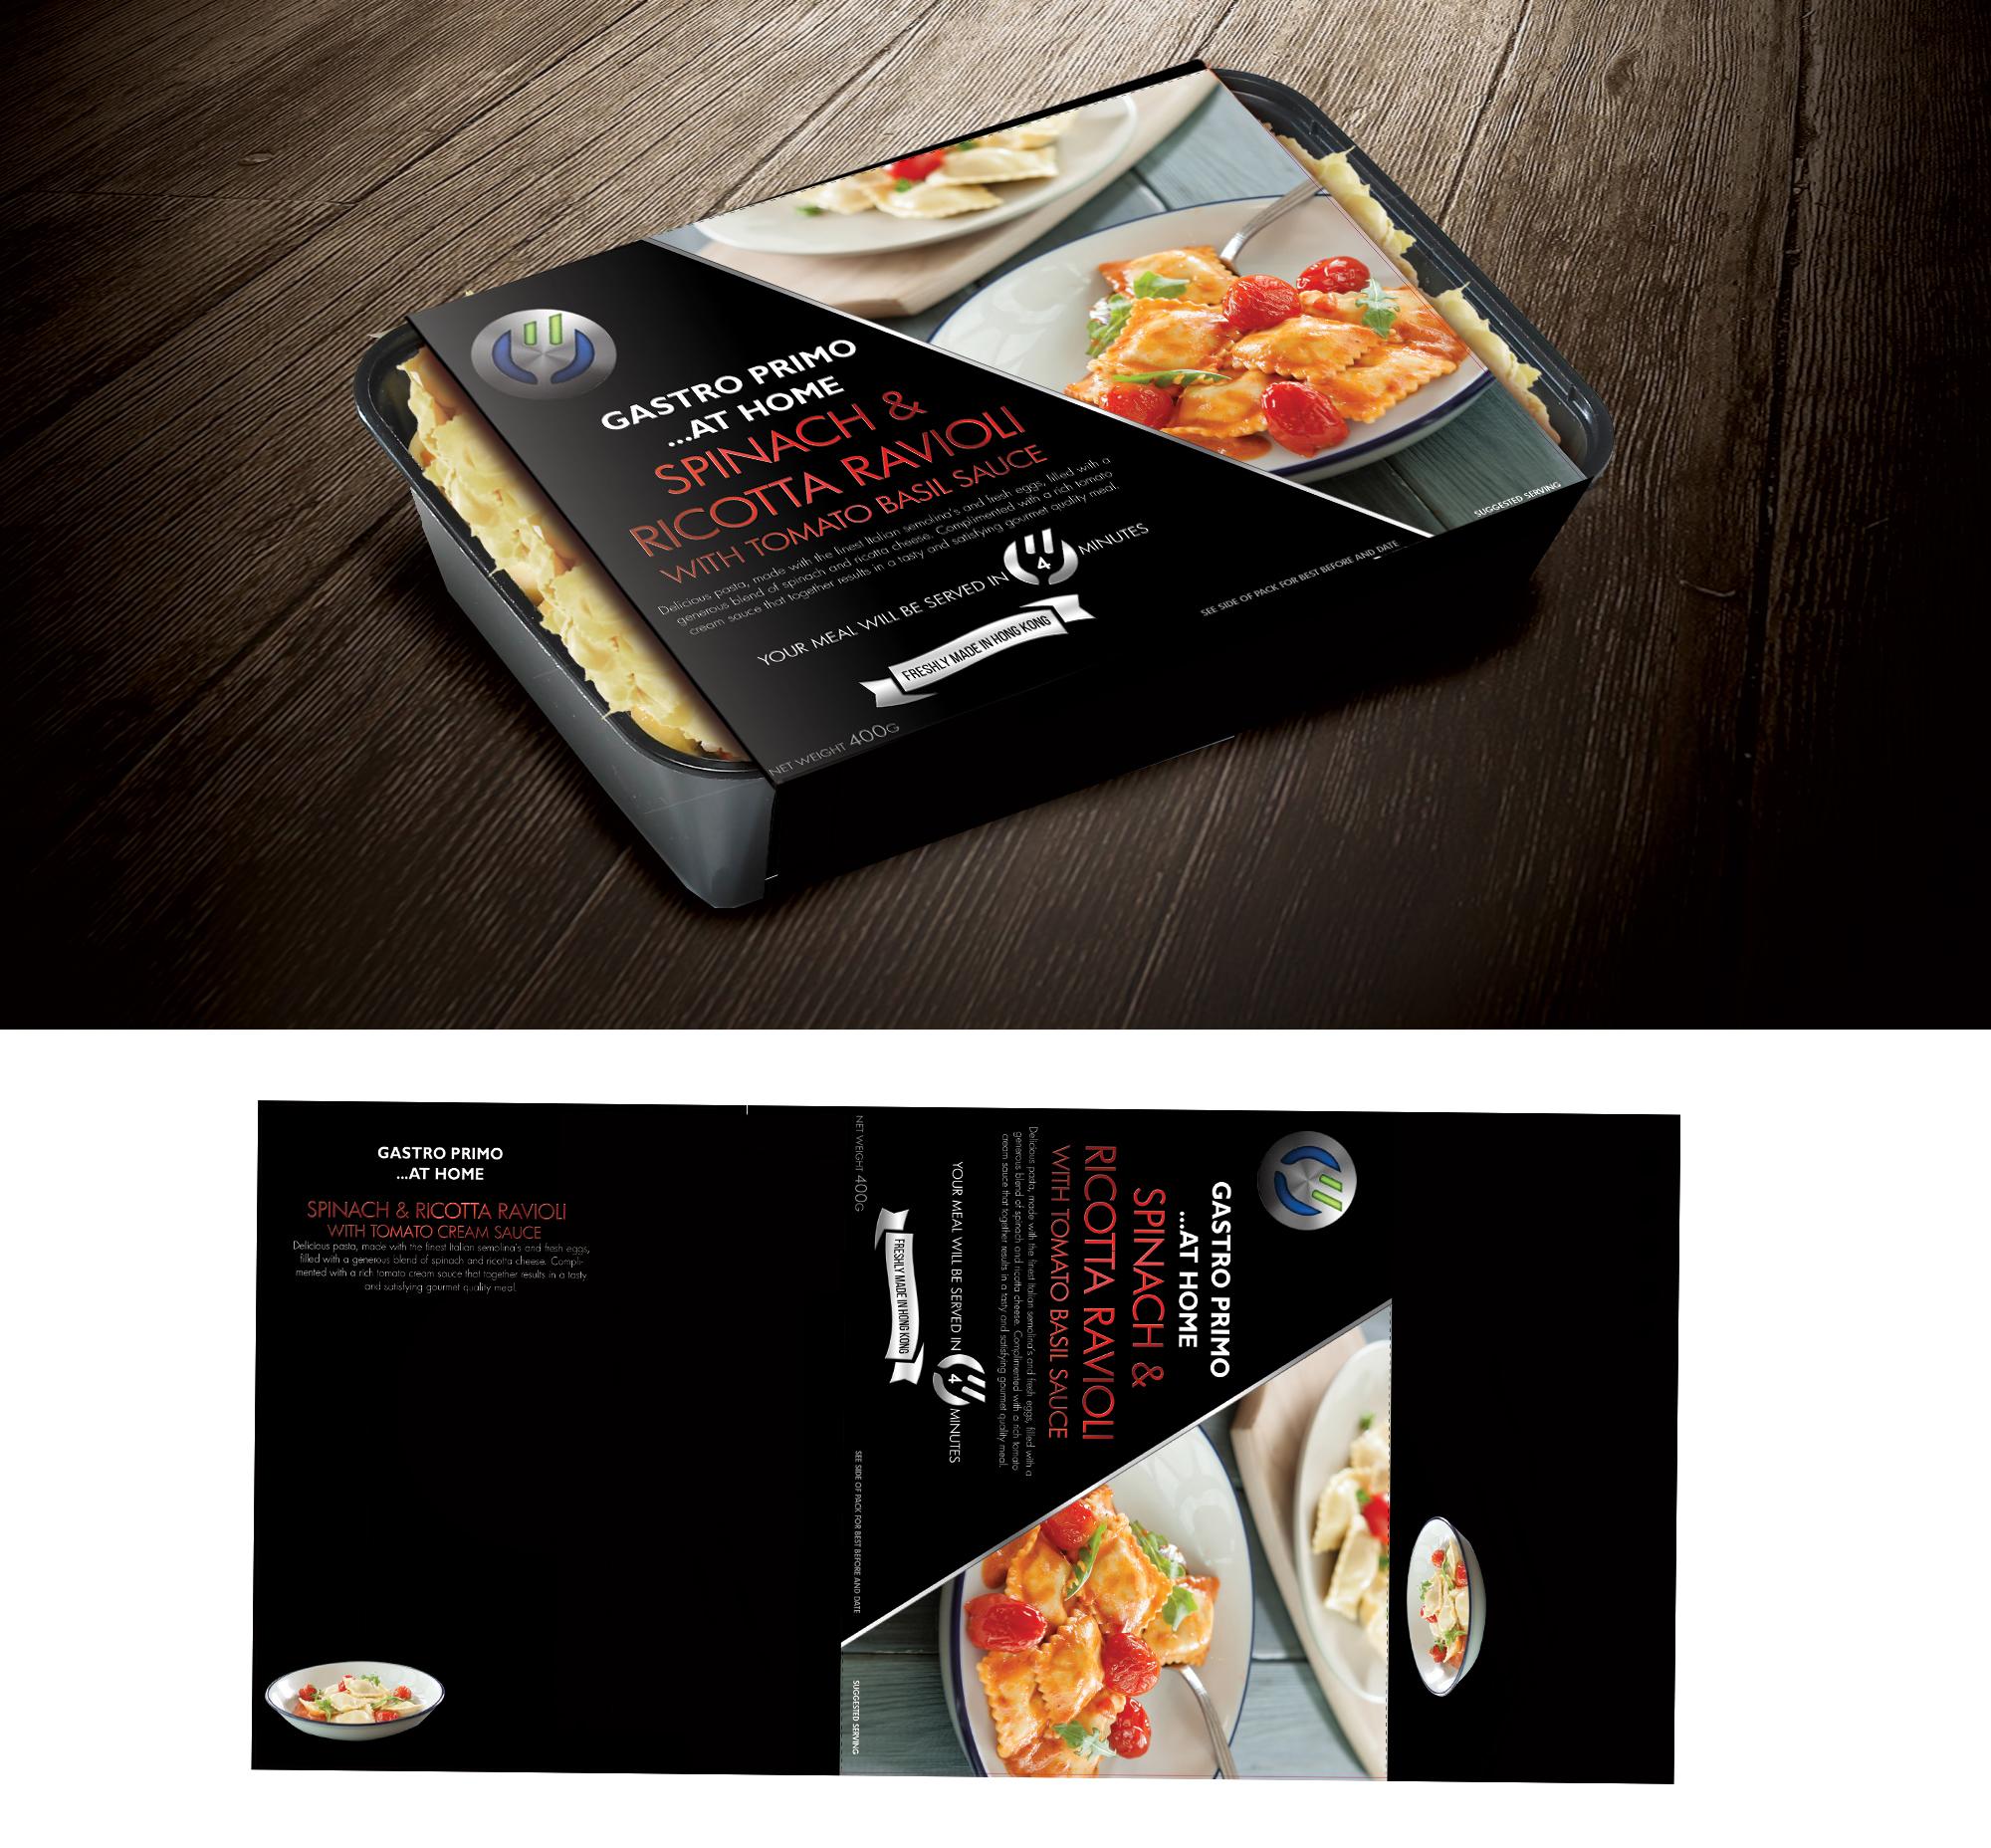 Spinach & Ricotta Ravioli With Tomato Basil Sauce.jpg